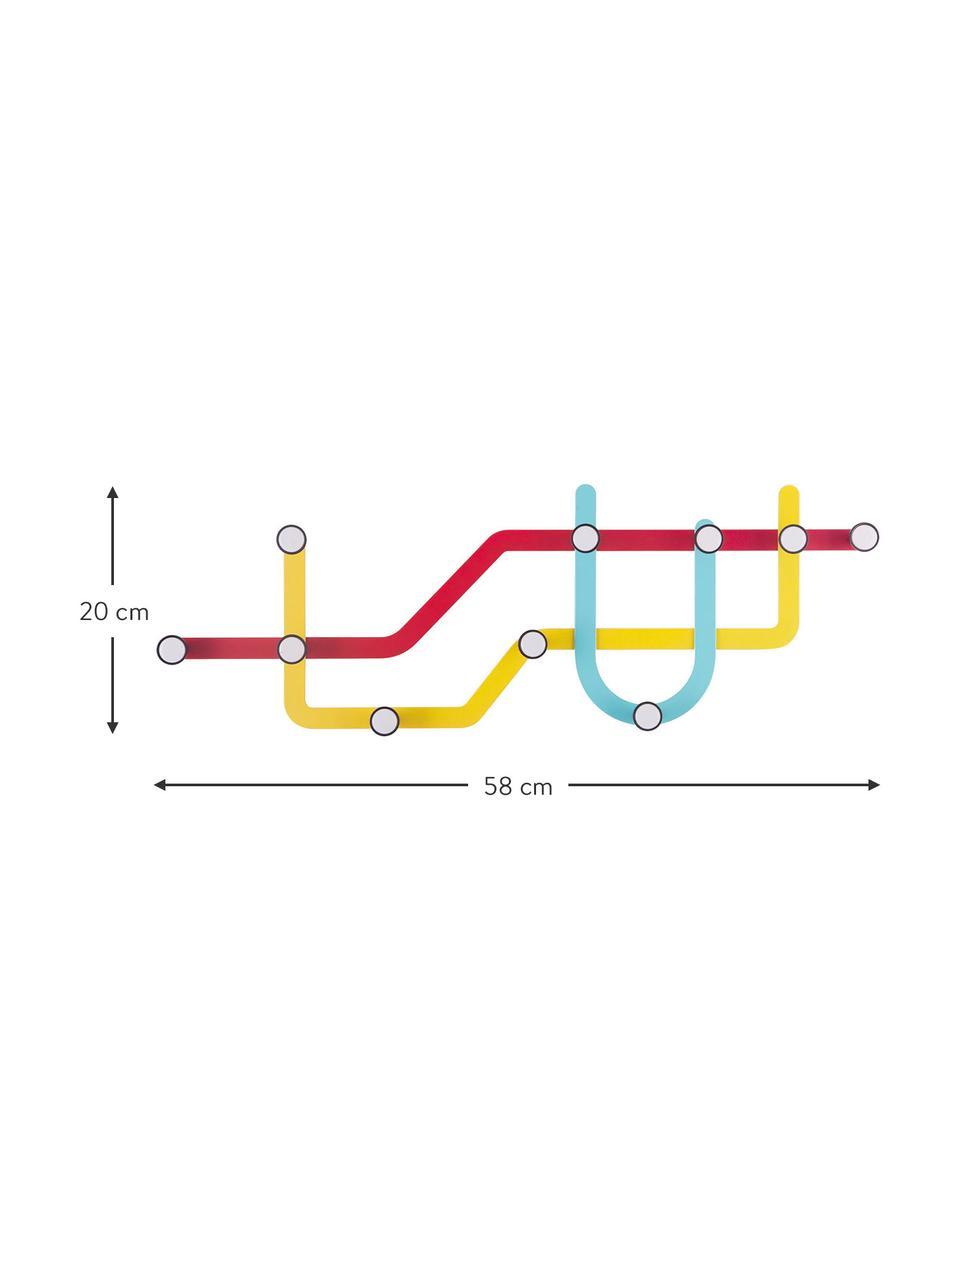 Design Wandgarderobe Subway, Rot, Gelb, Hellblau, 58 x 20 cm